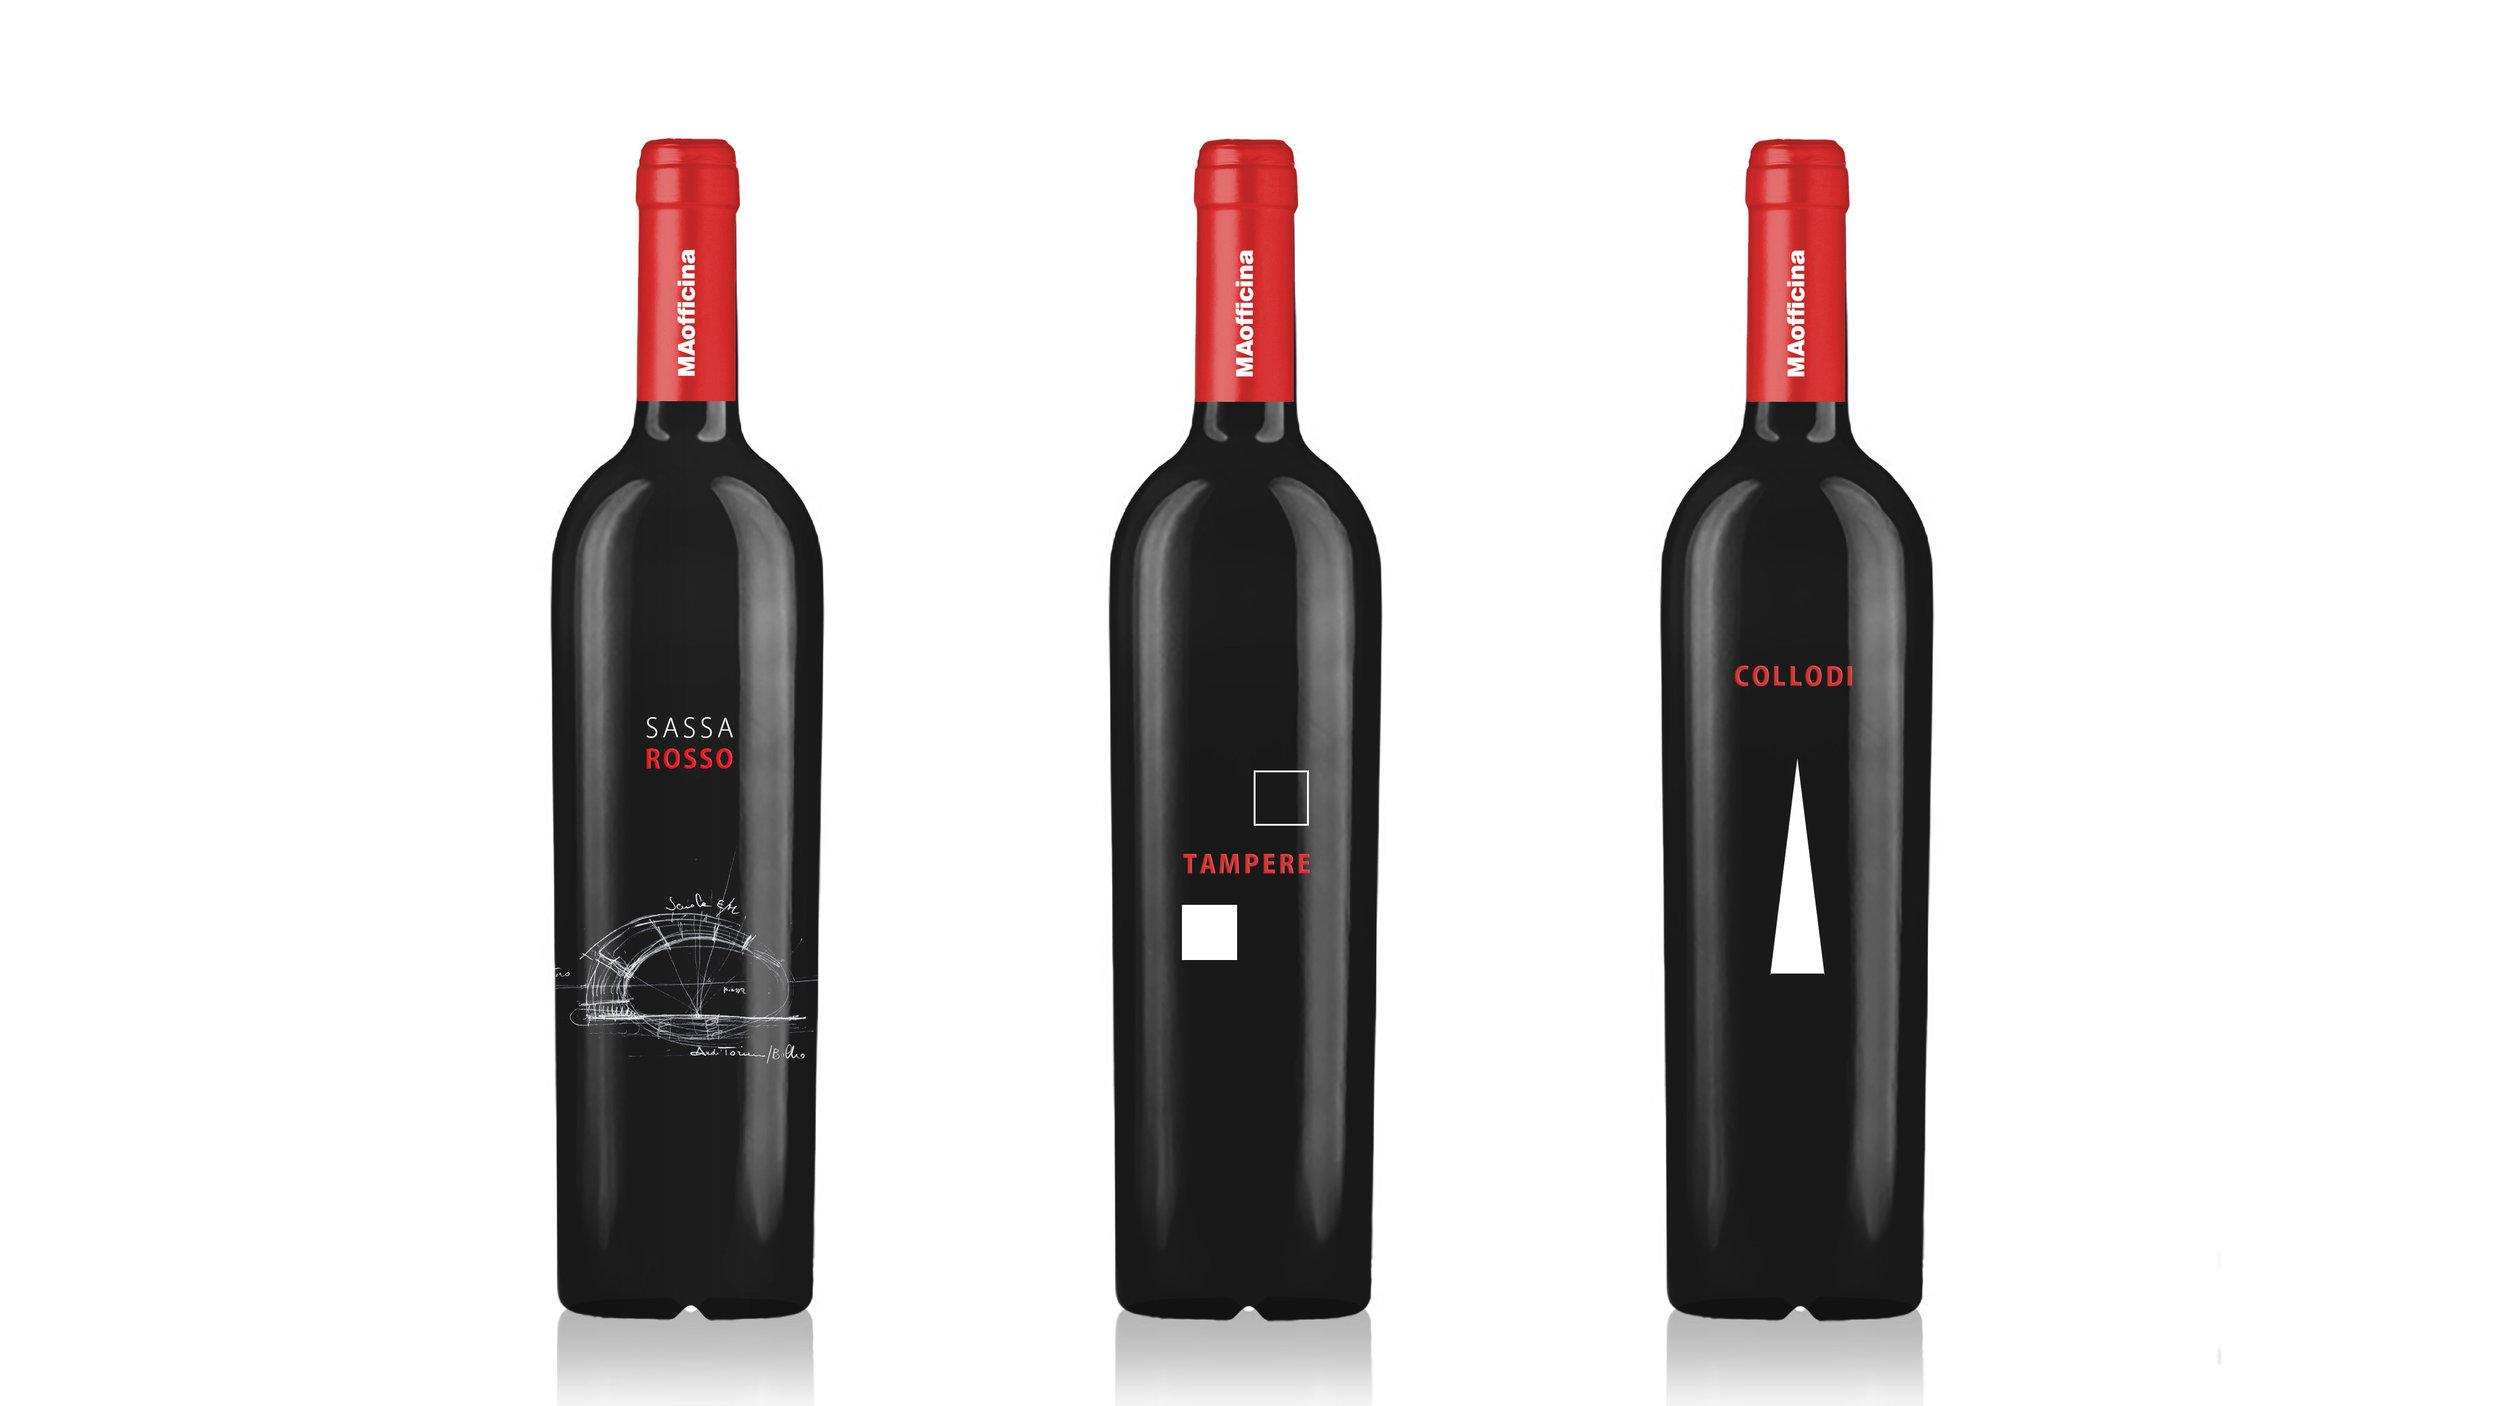 MAofficina_italian-wine-collection.jpg